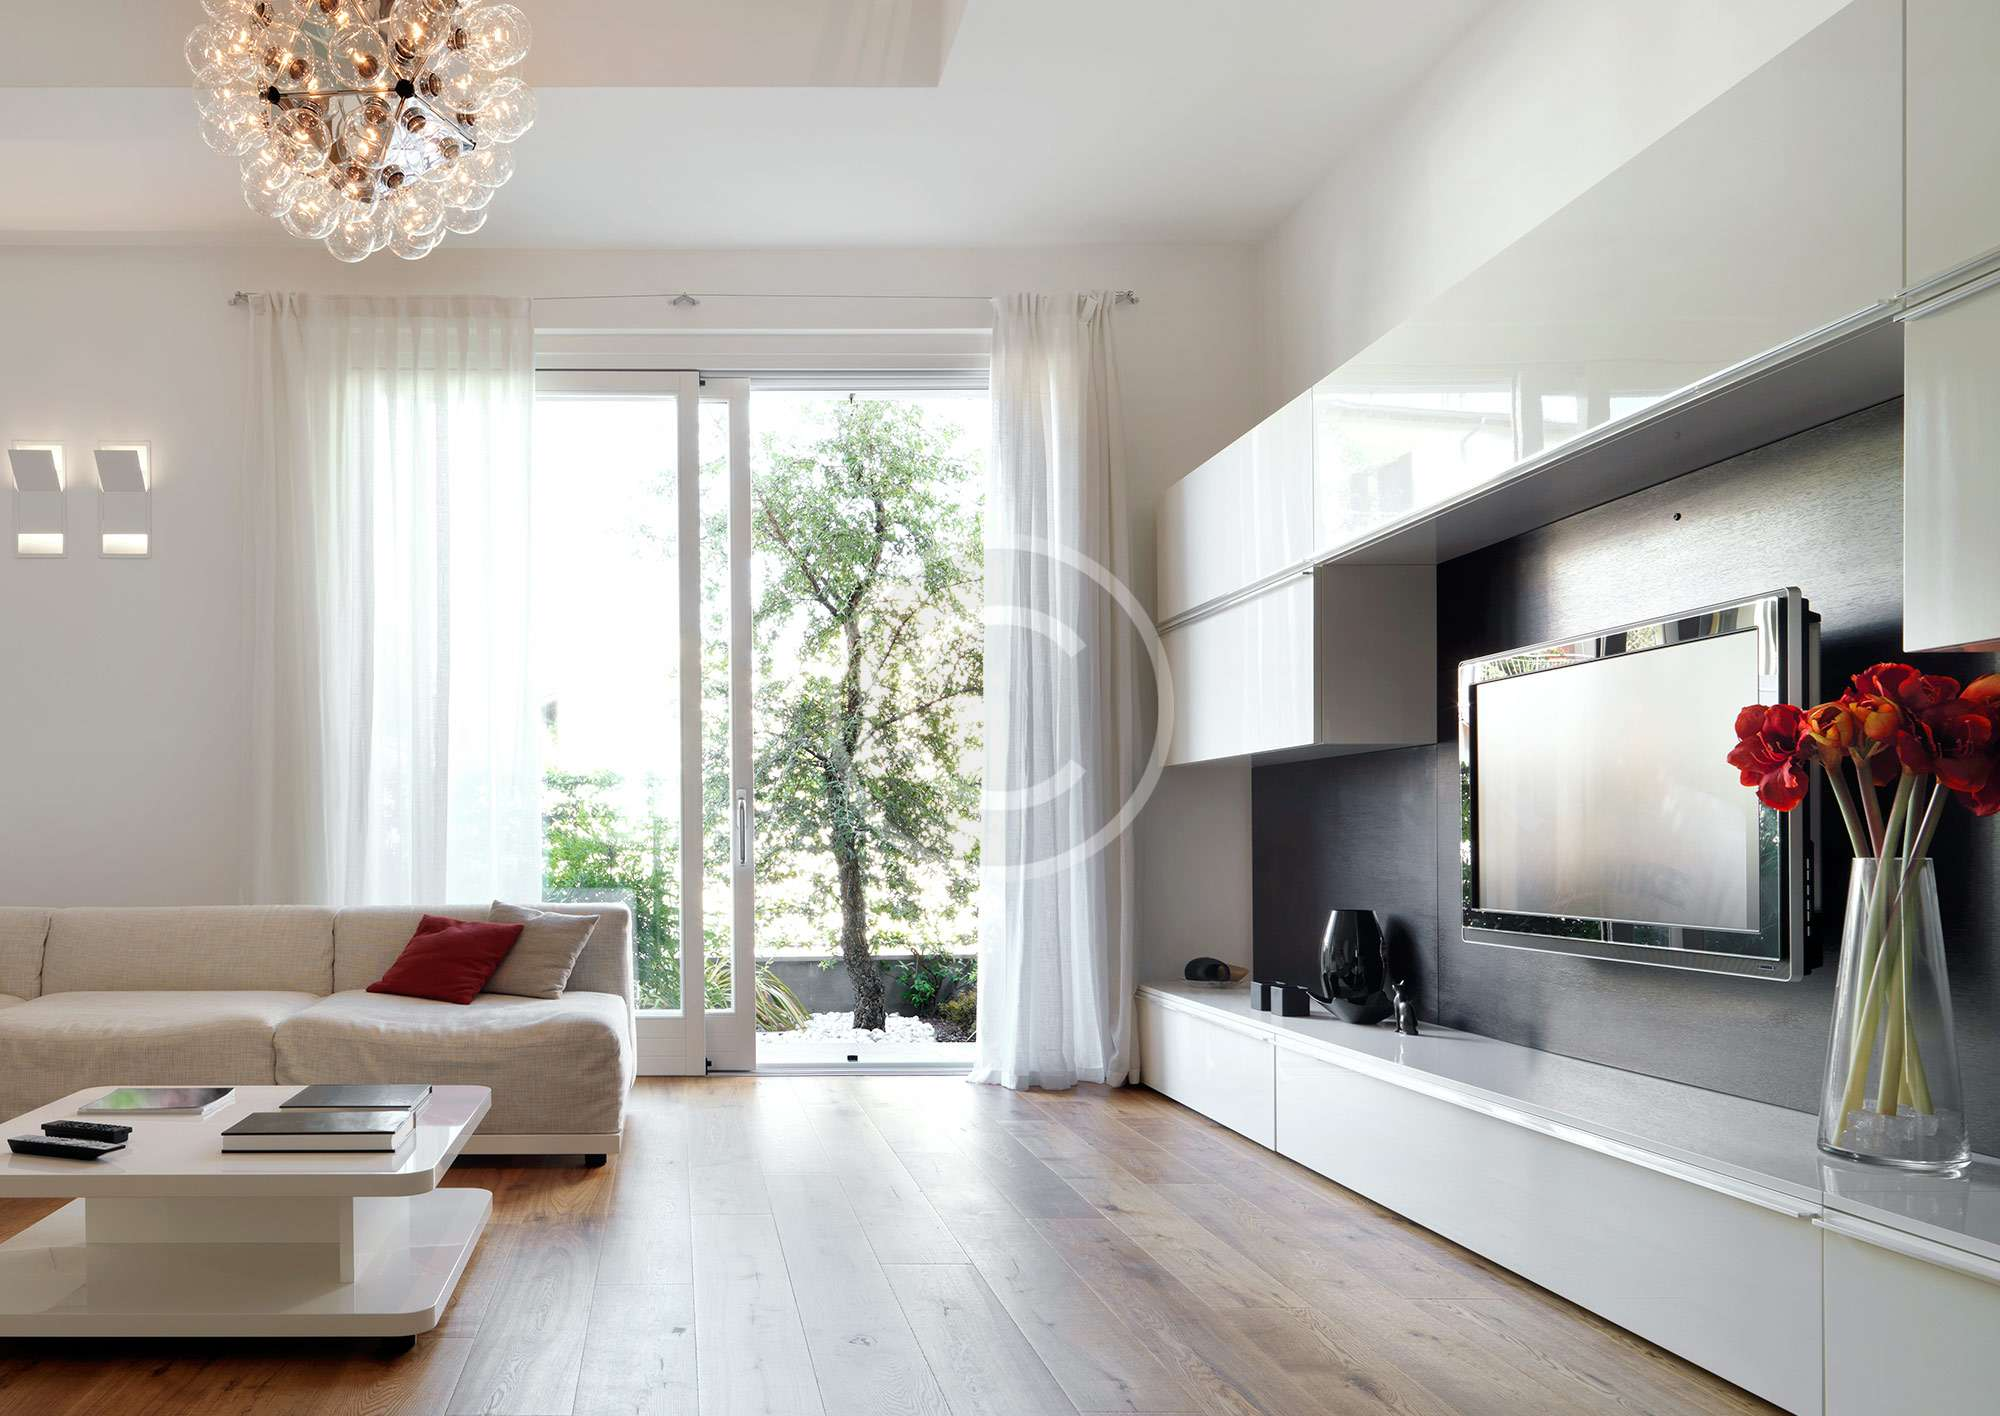 Interior Style: Urban Industrial